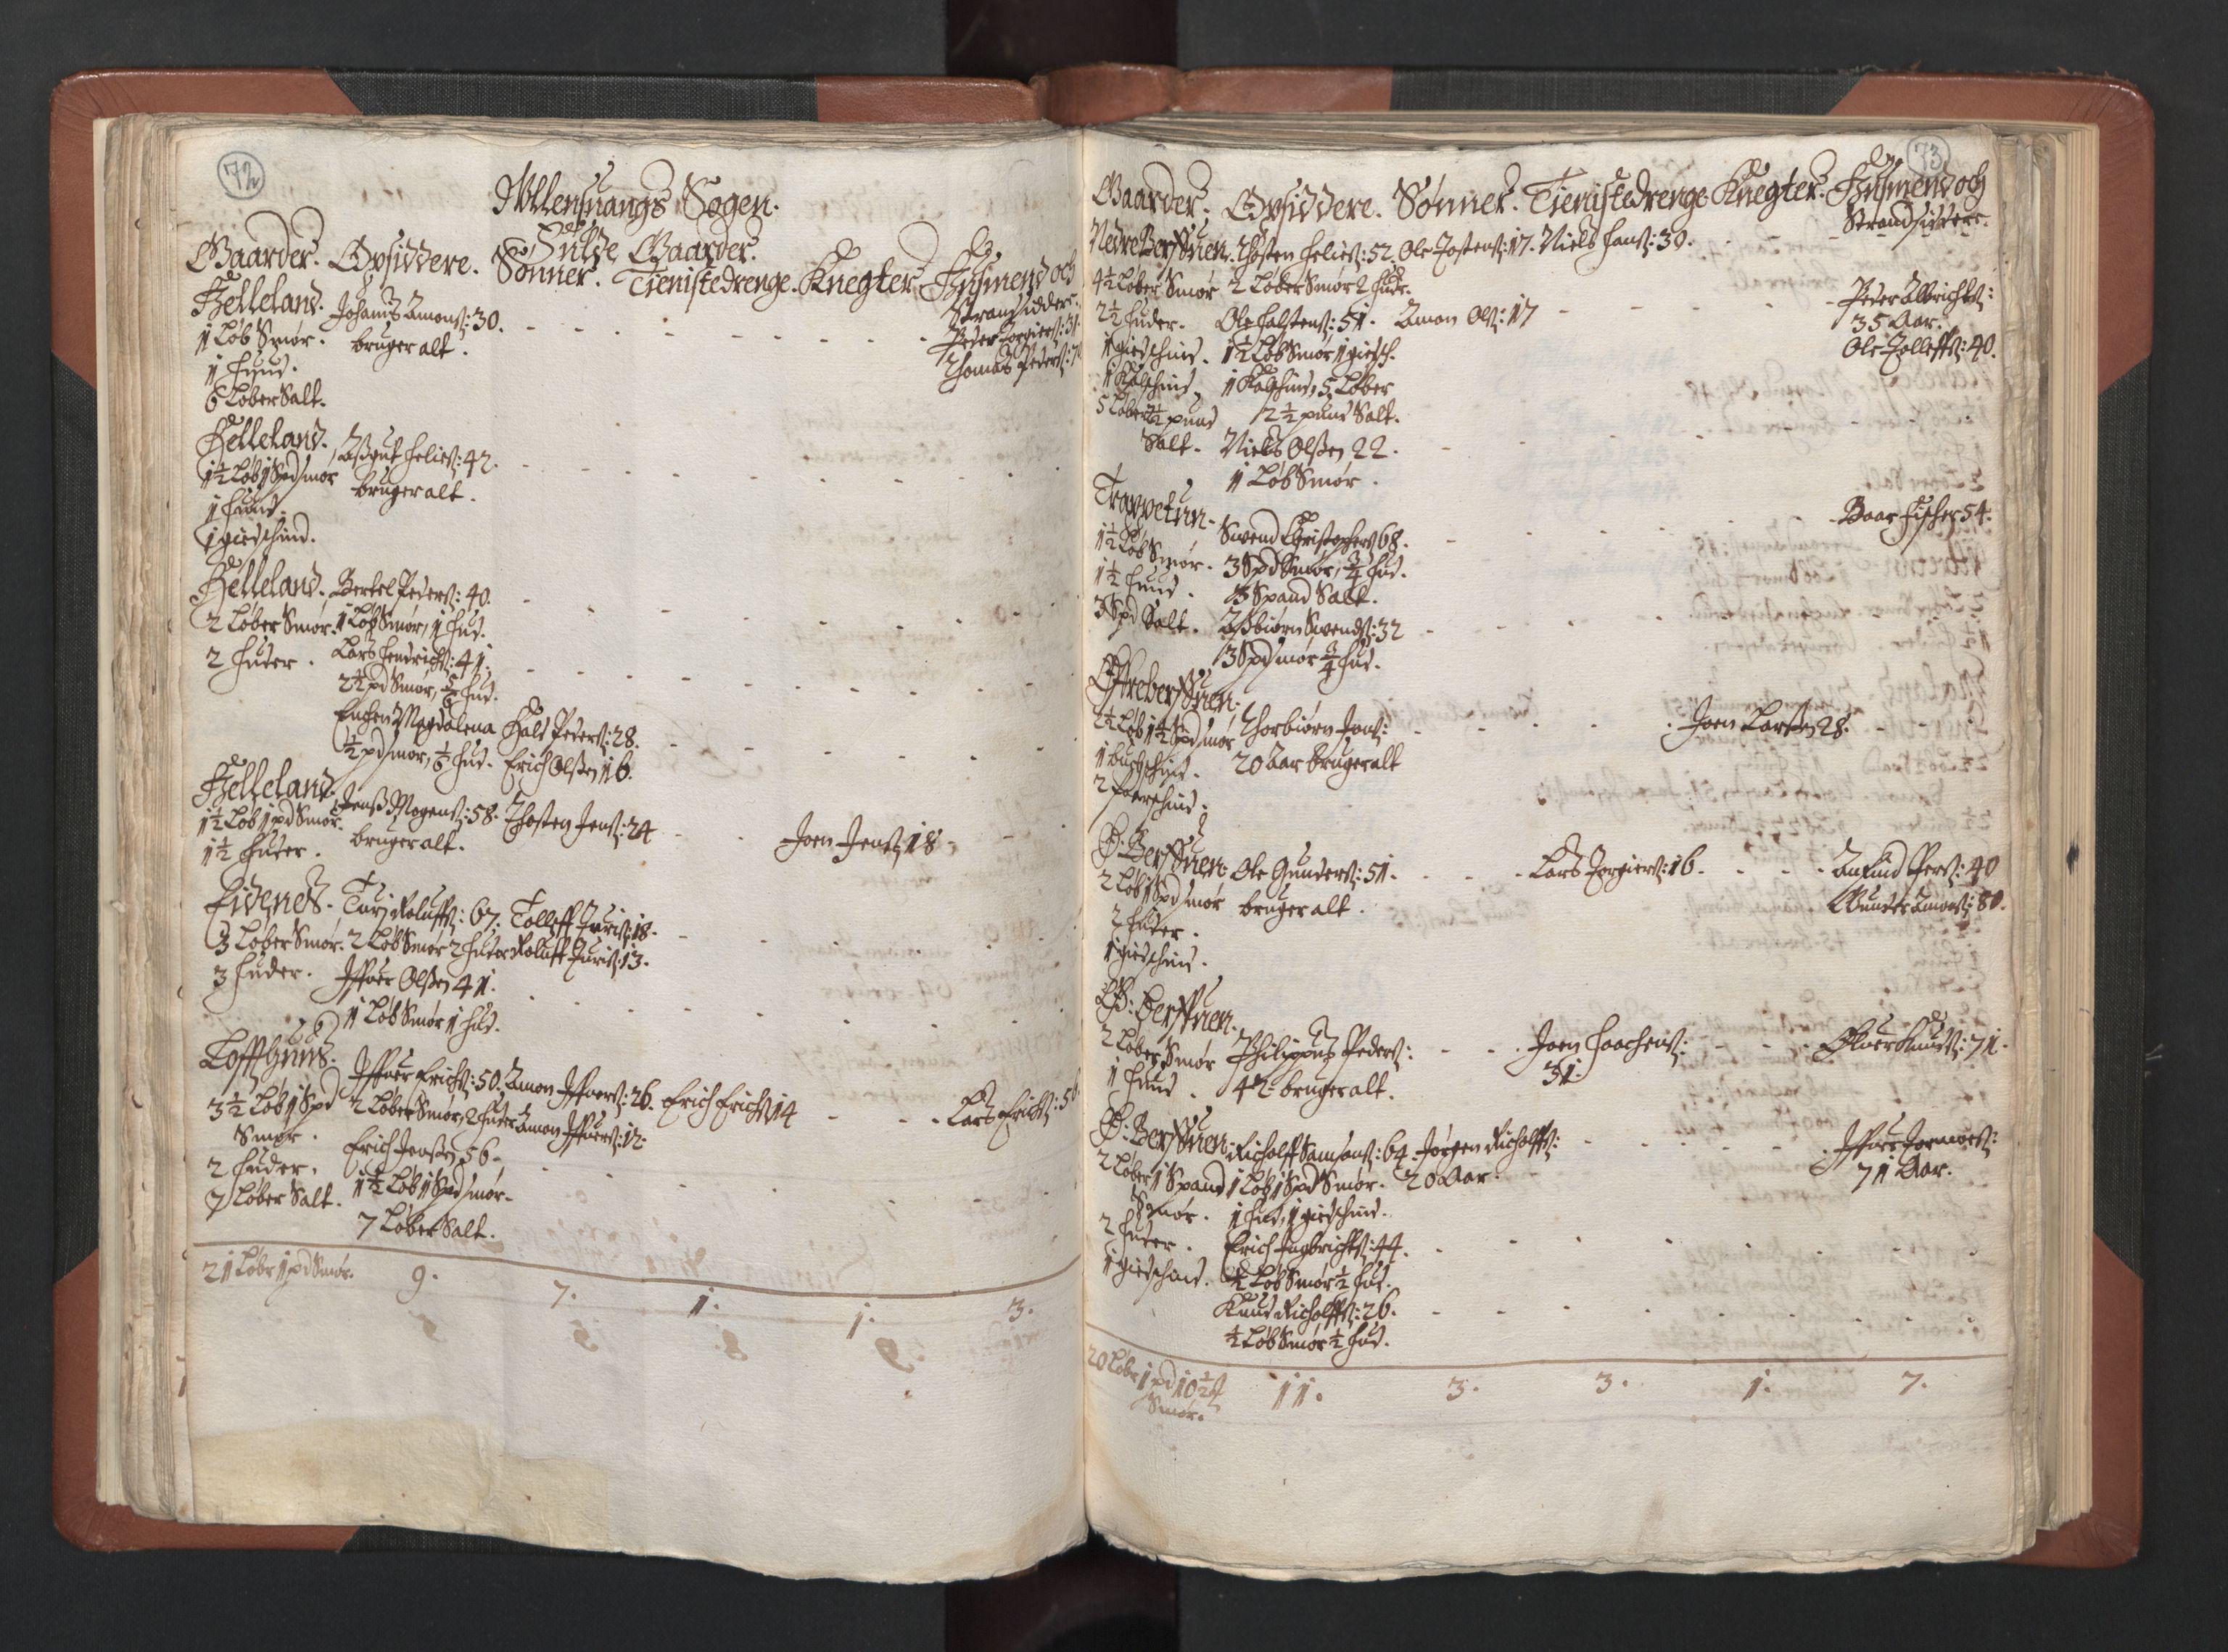 RA, Fogdenes og sorenskrivernes manntall 1664-1666, nr. 14: Hardanger len, Ytre Sogn fogderi og Indre Sogn fogderi, 1664-1665, s. 72-73